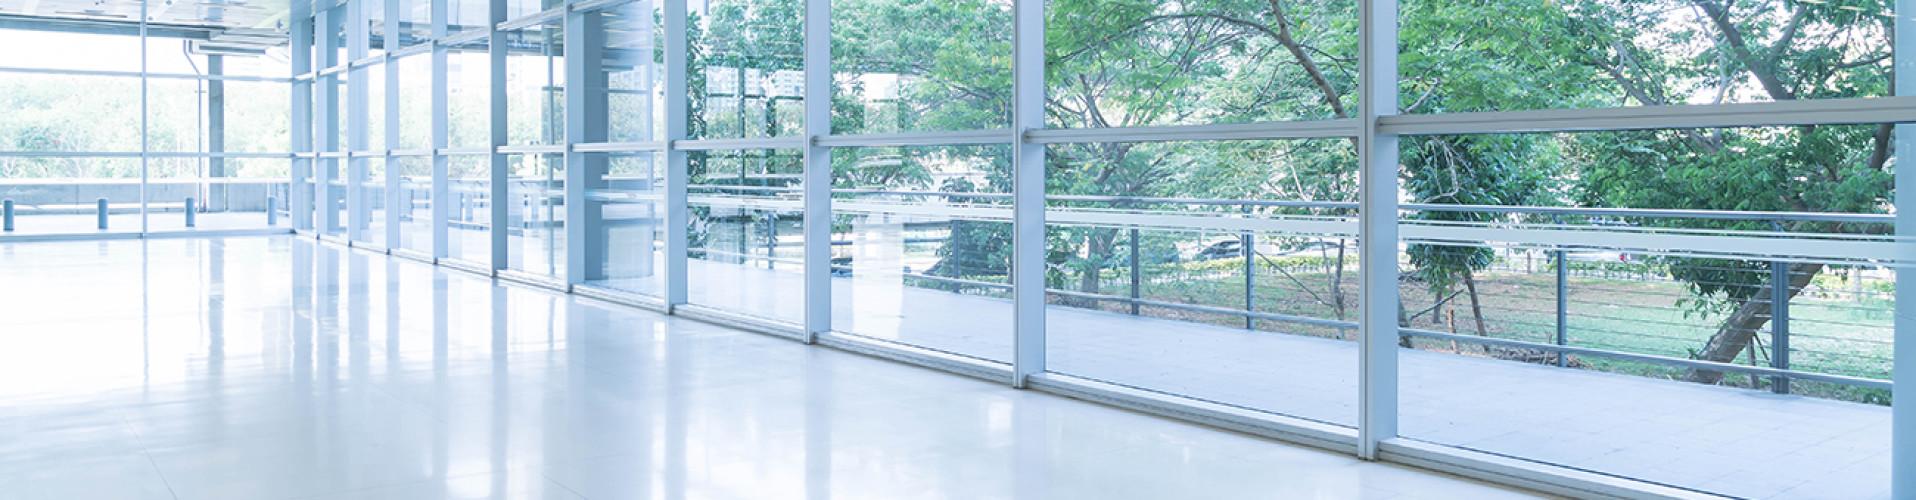 Transparante vloercoating VVE